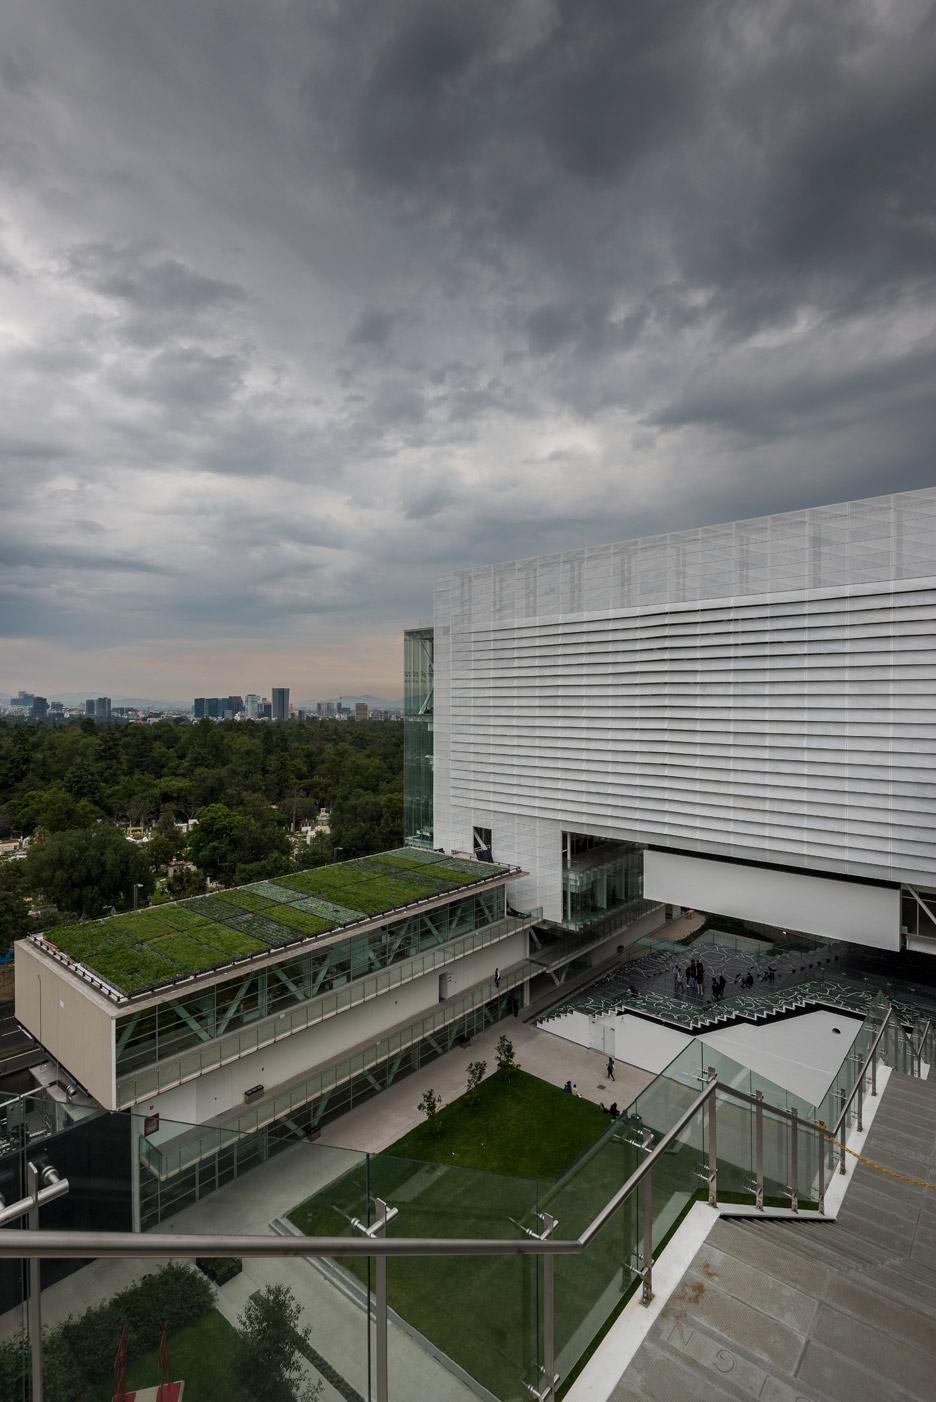 Enrique Norten completes new campus for Centro art and design school in Mexico City